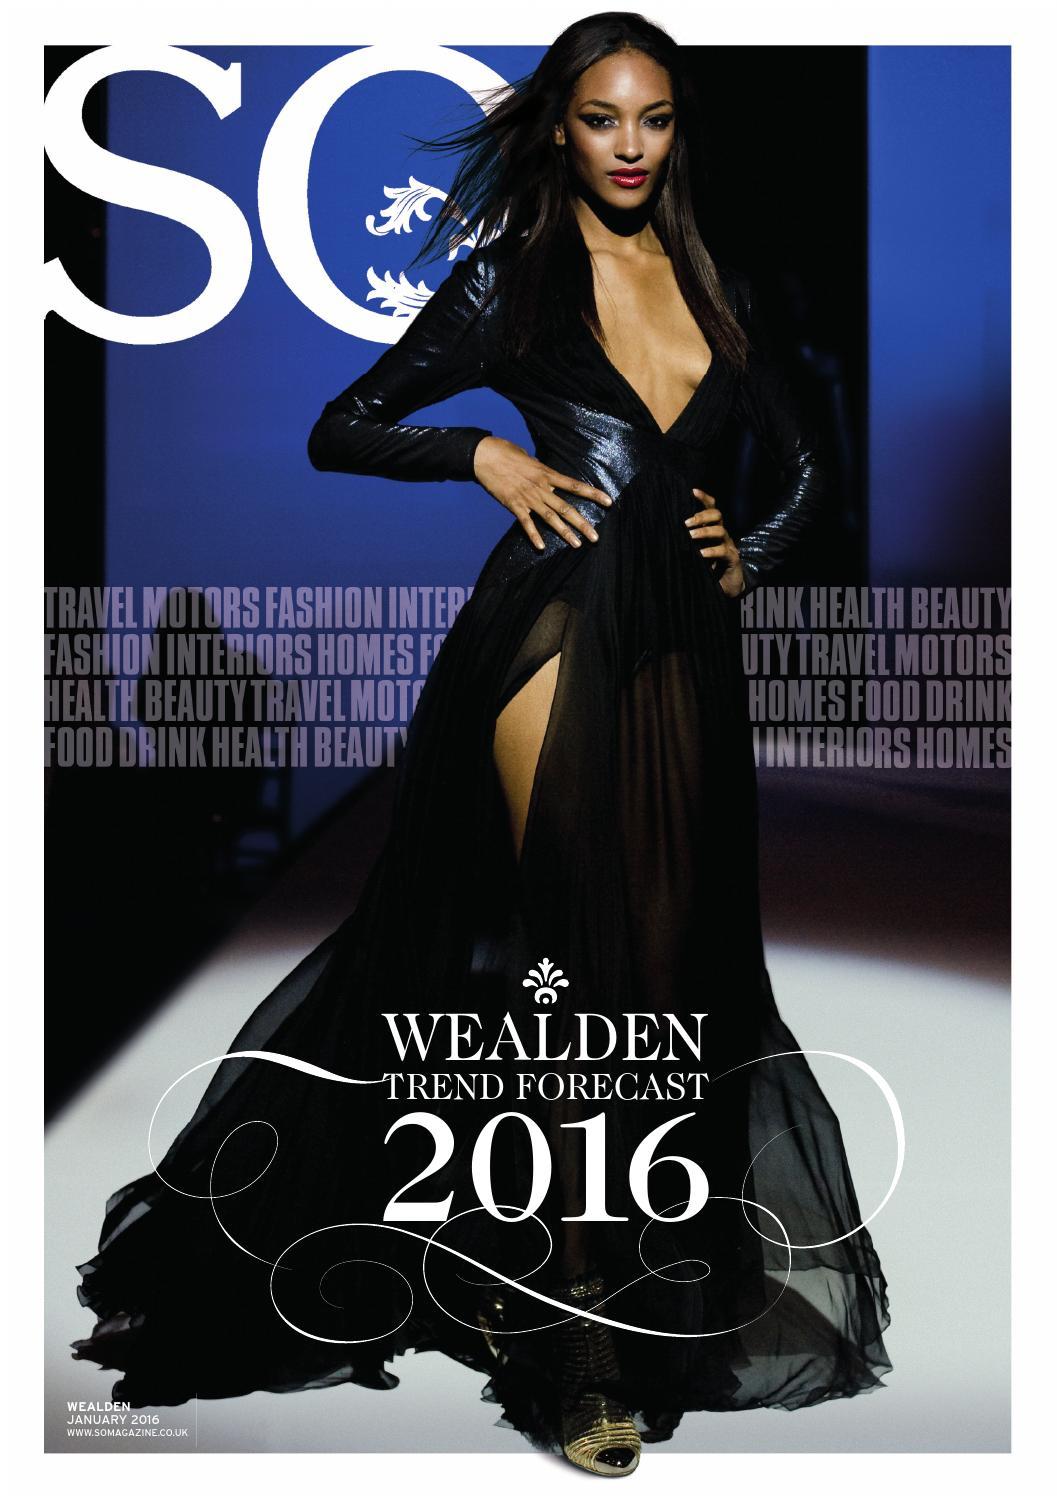 32713d0ea So Wealden January 2016 by One Media - issuu